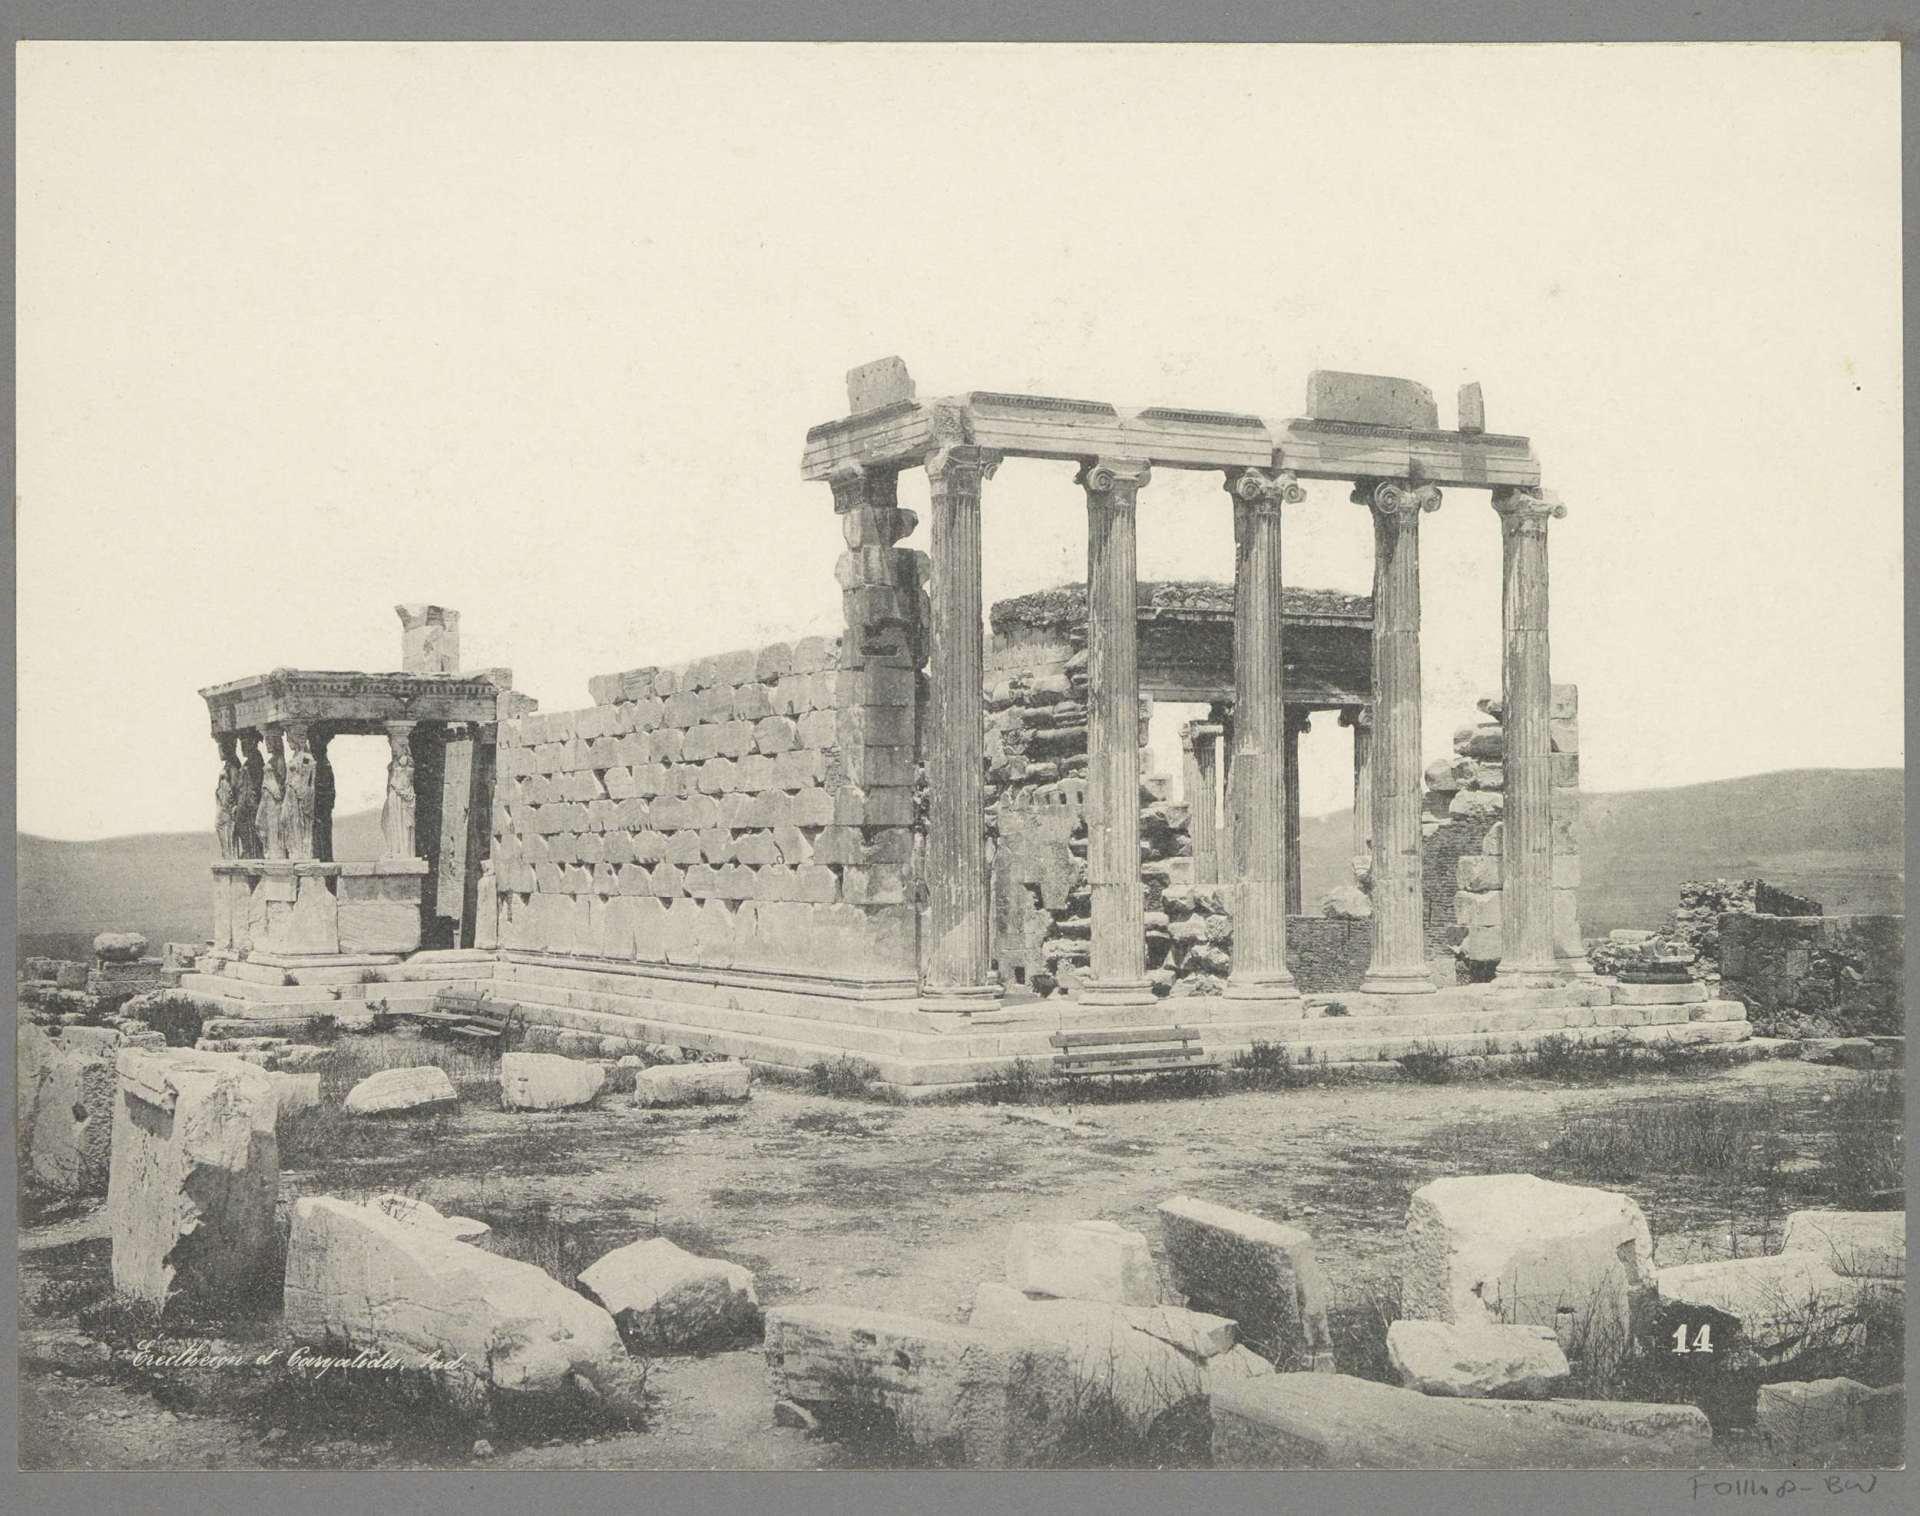 Construction of the Erechtheion